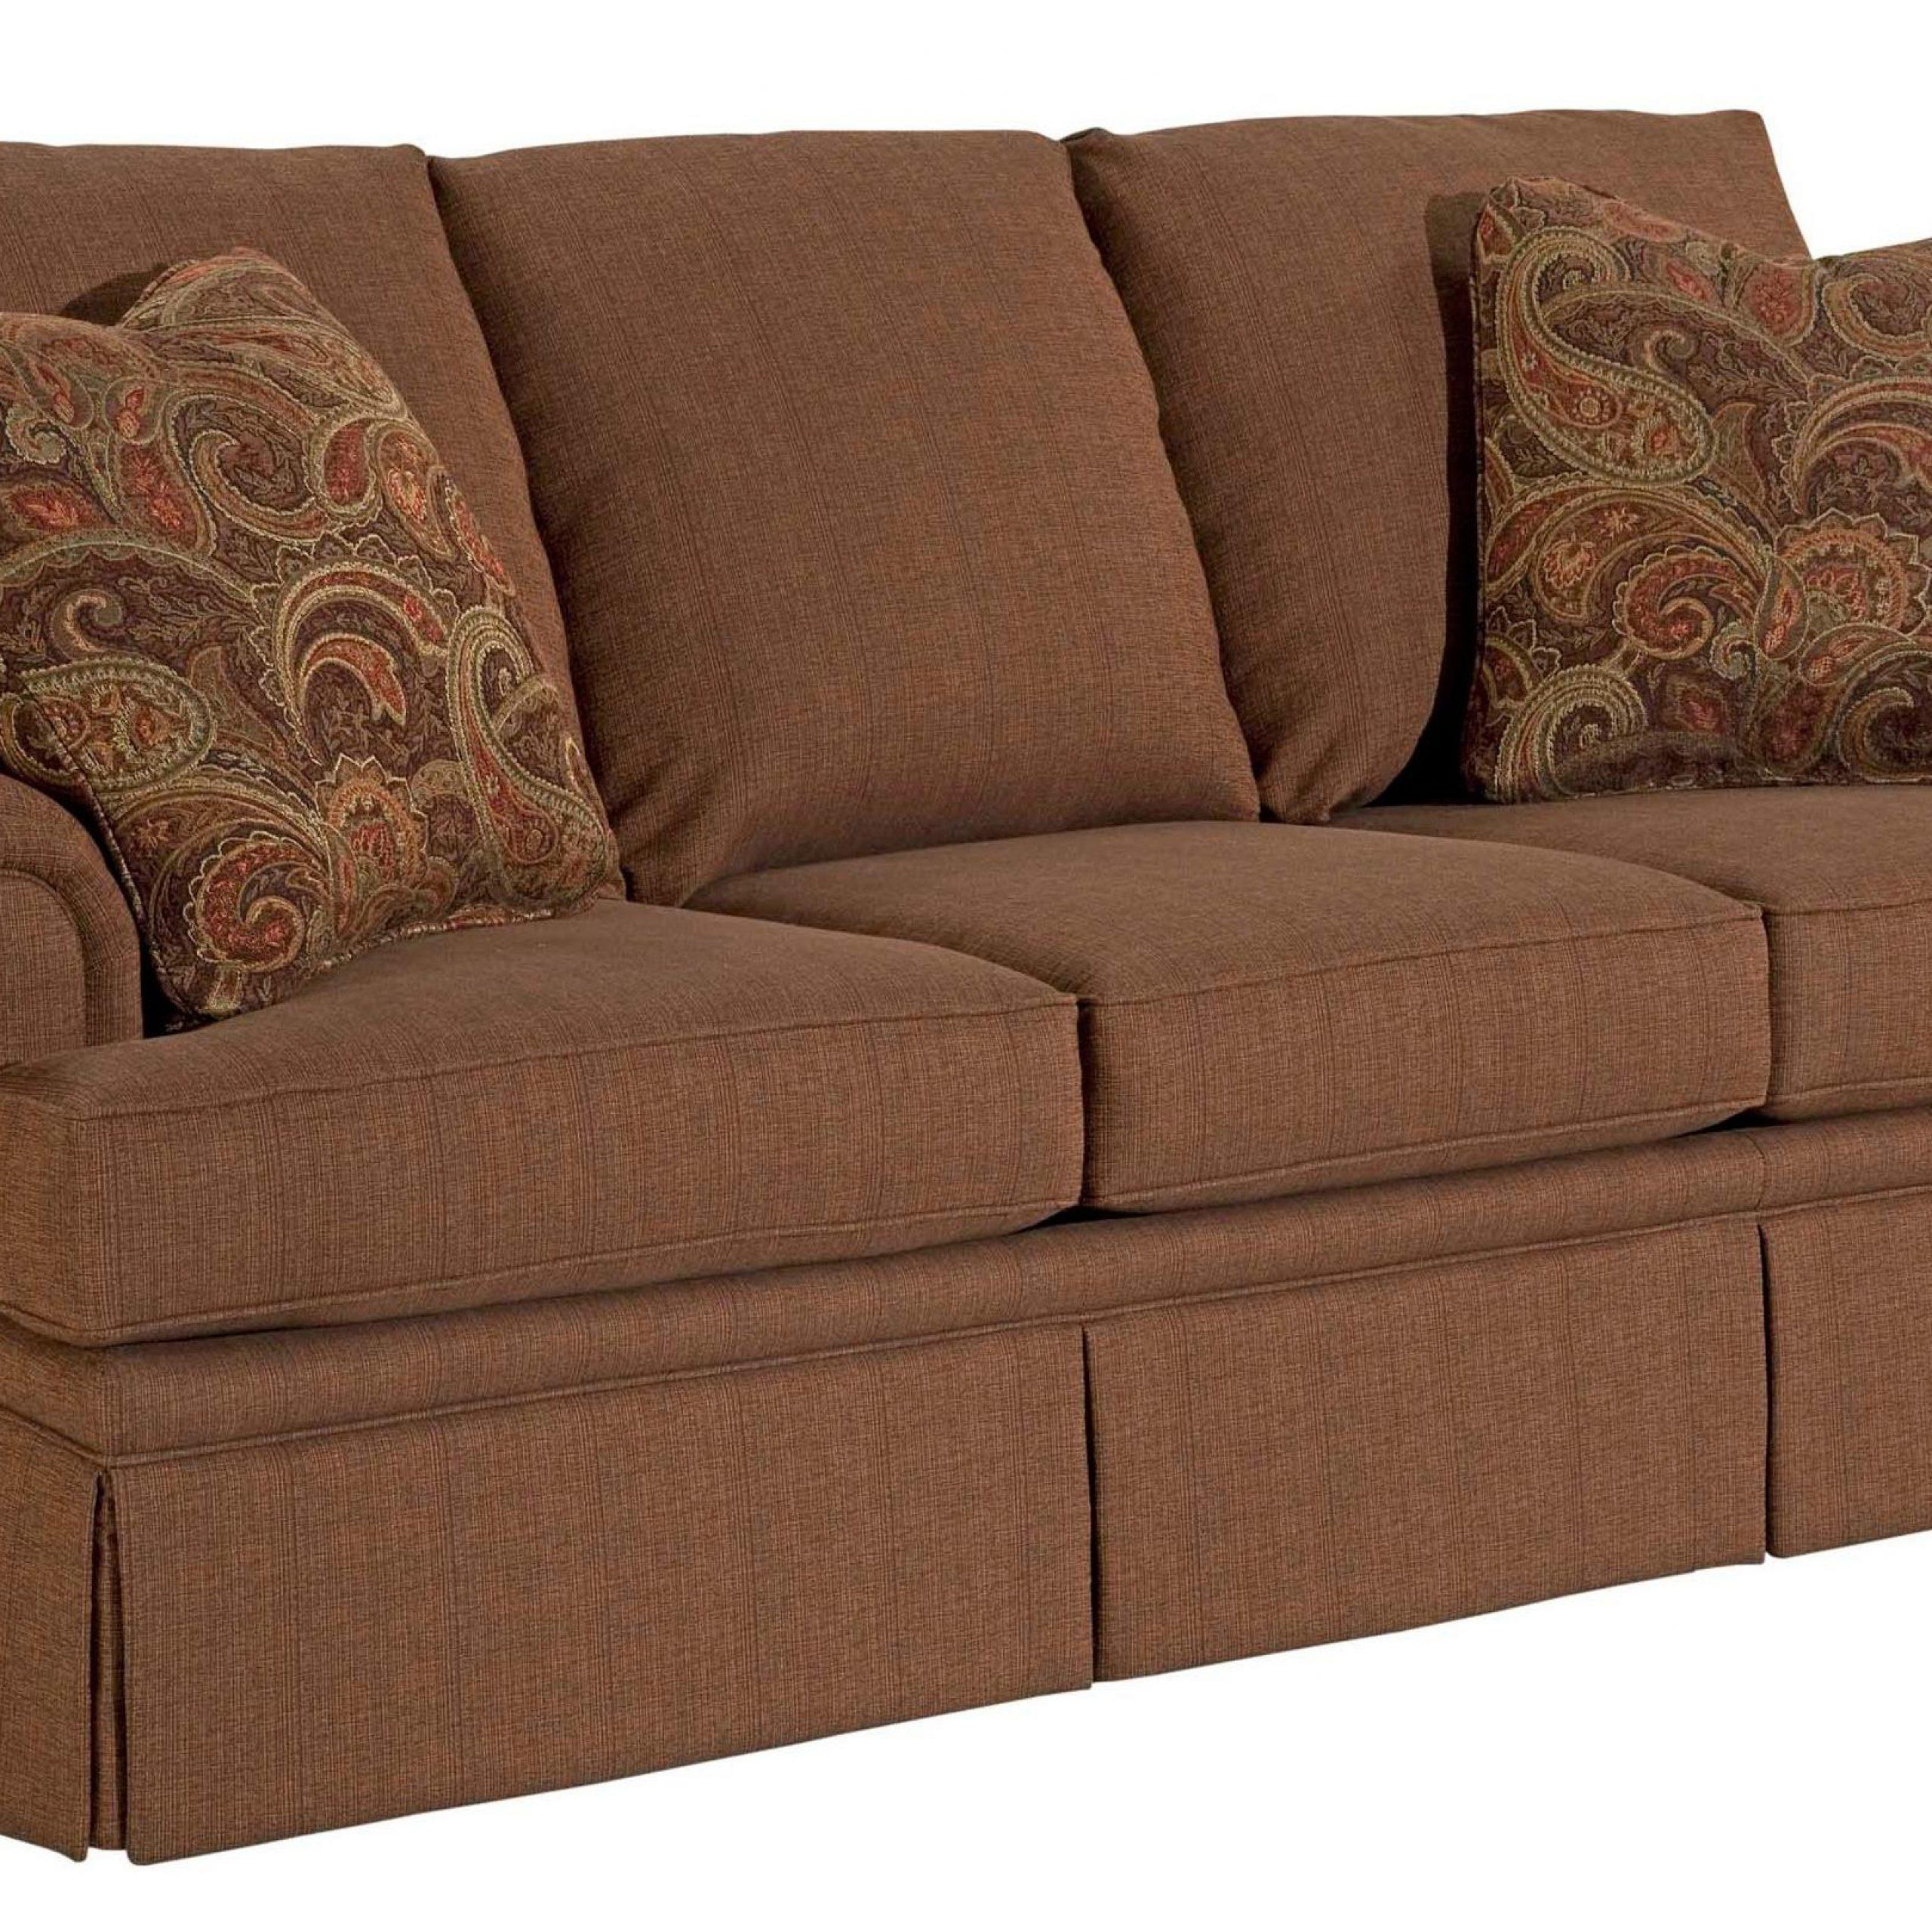 Broyhill Sofa Fabric Choices Laramie 5081 Sofa Collection Regarding Broyhill Sectional Sofas (View 10 of 15)